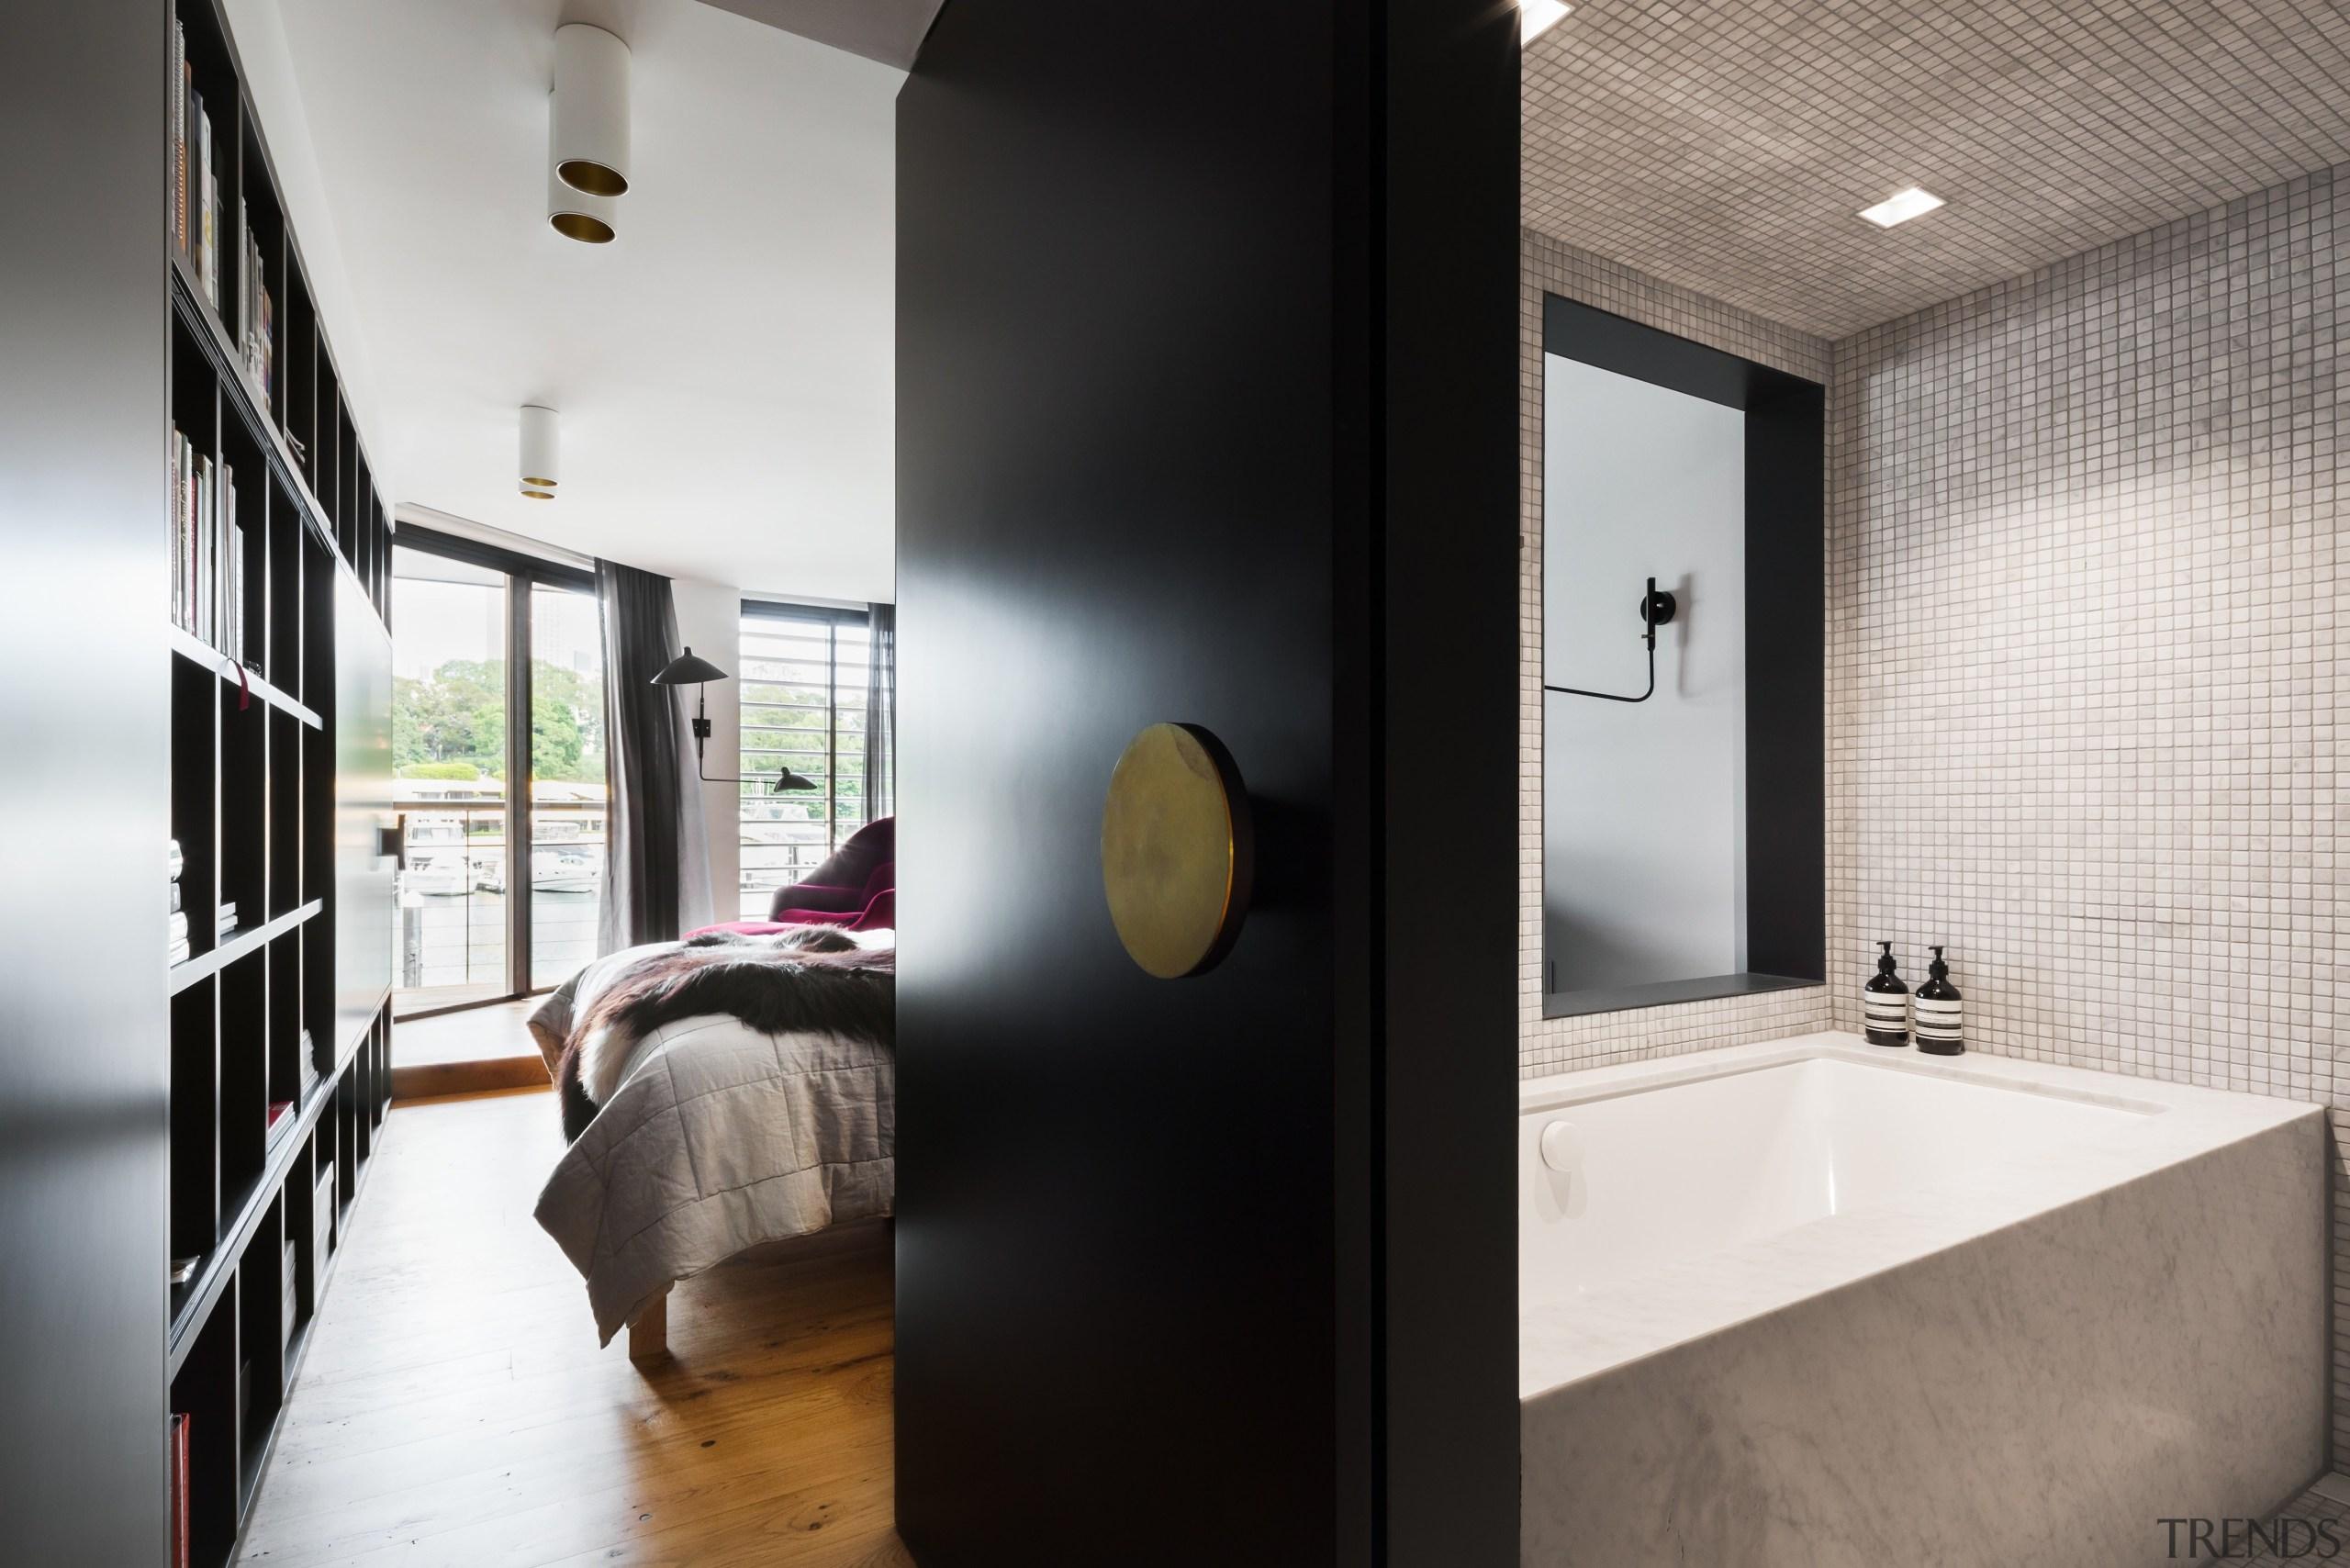 Winner Bathroom Suite – Architect Prineas - architecture architecture, bathroom, ceiling, home, house, interior design, room, white, black